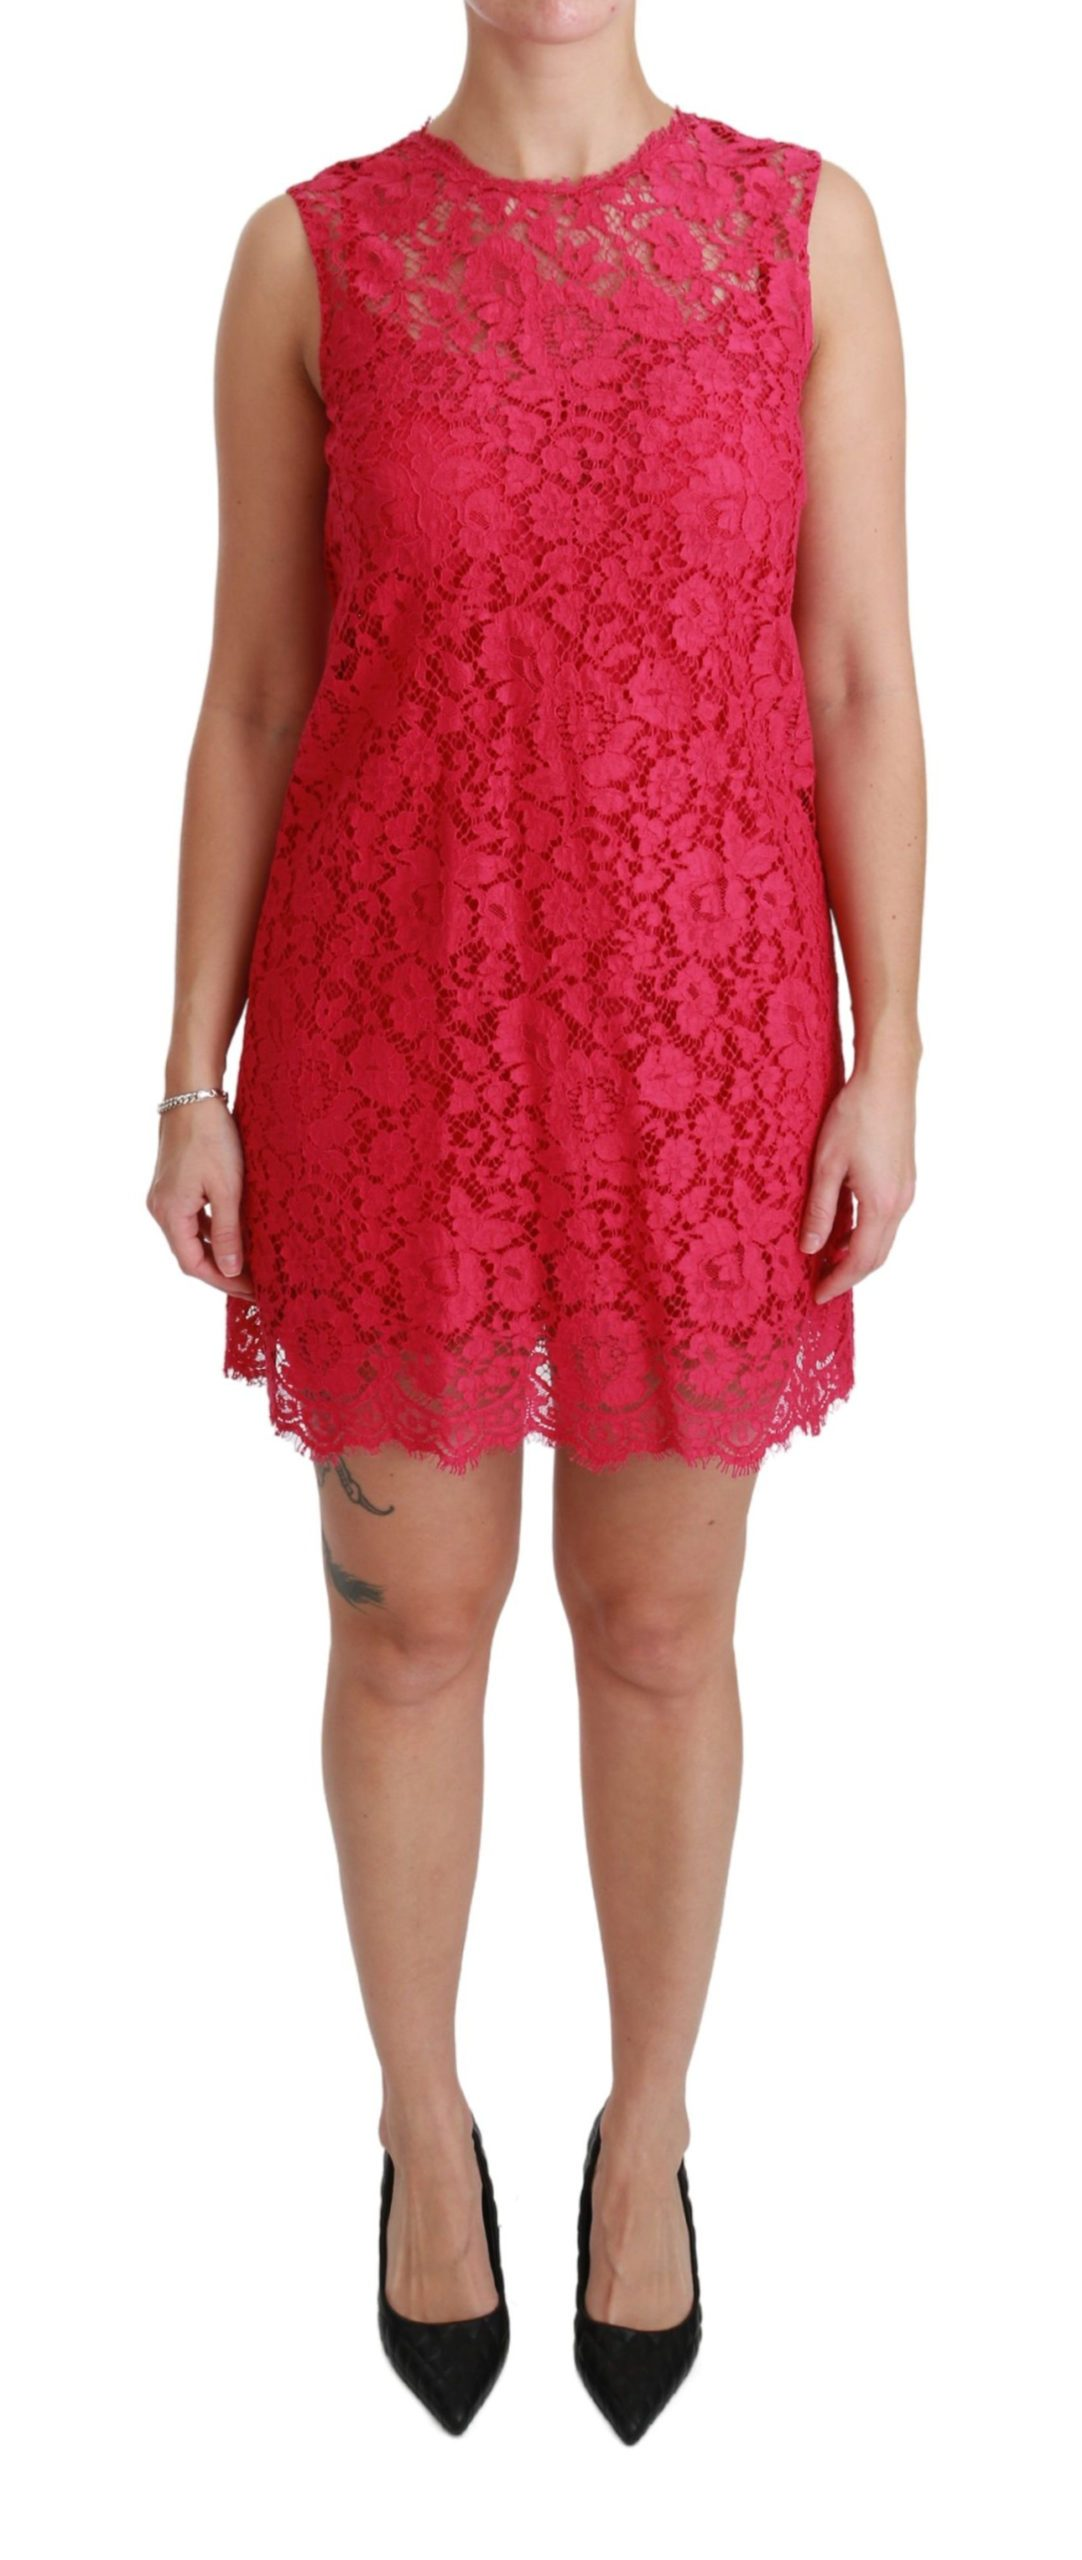 Dolce & Gabbana Women's Floral Lace Shift Gown Mini Dress Pink DR2465 - IT36   XS